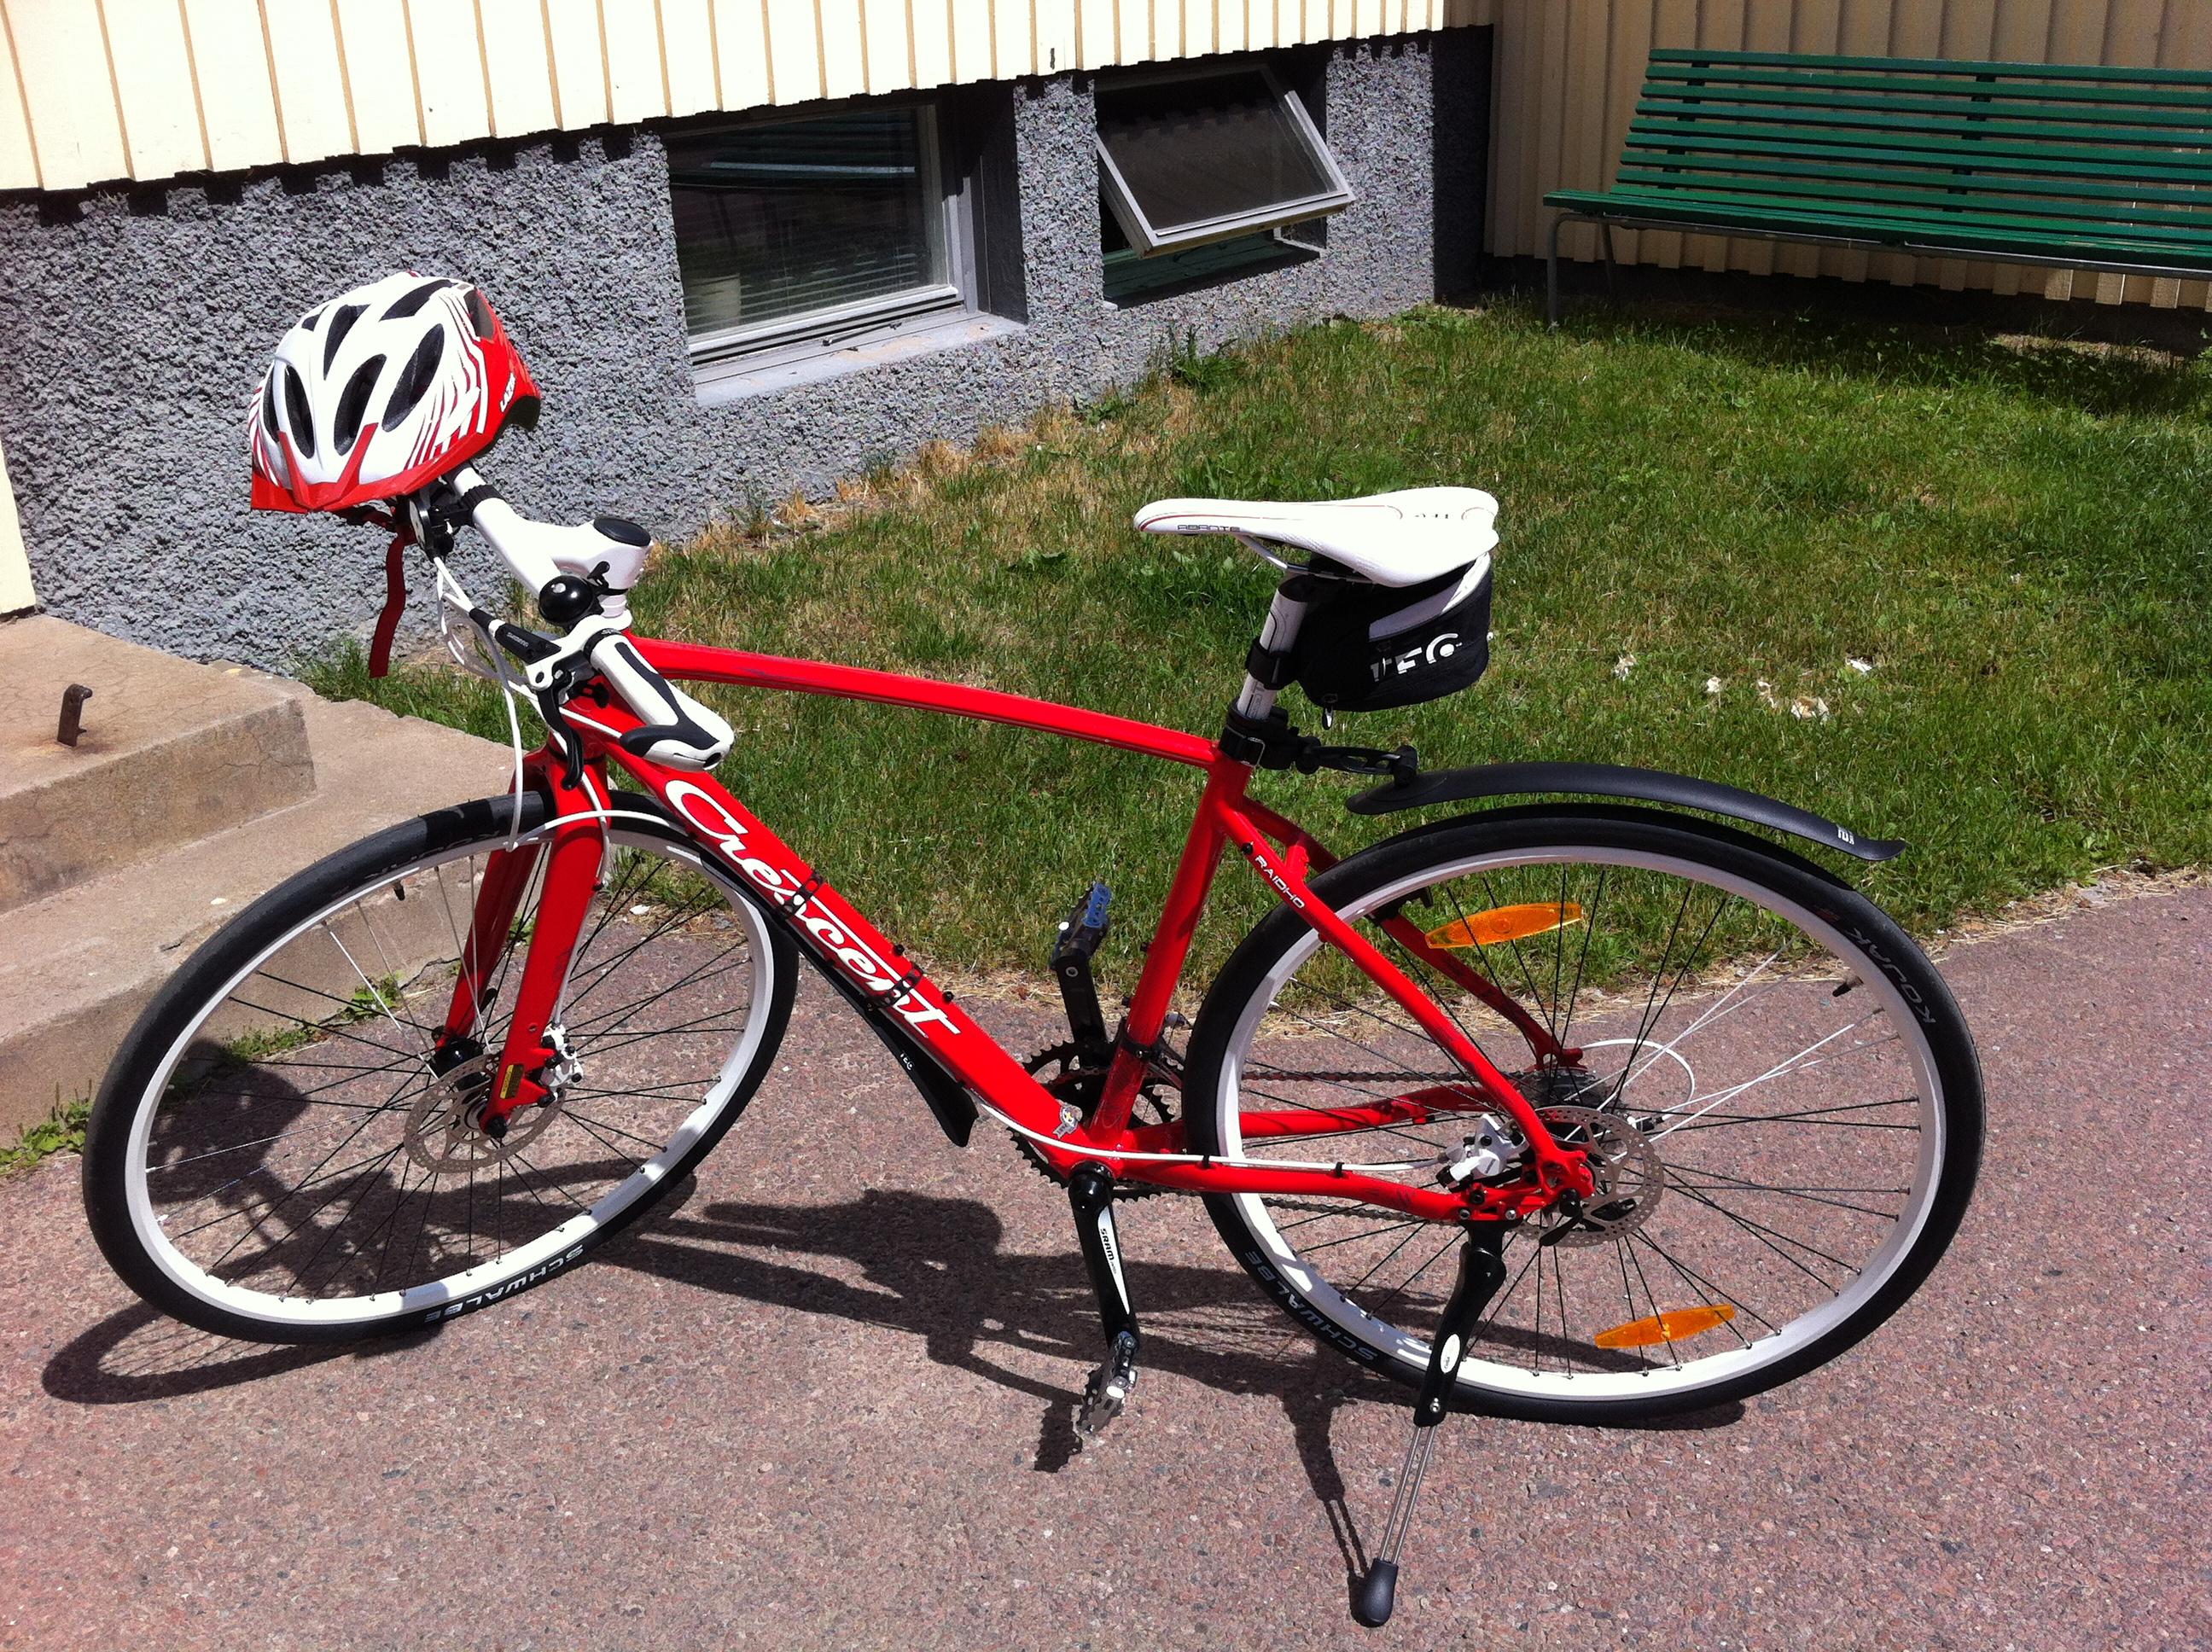 19.Cykeln